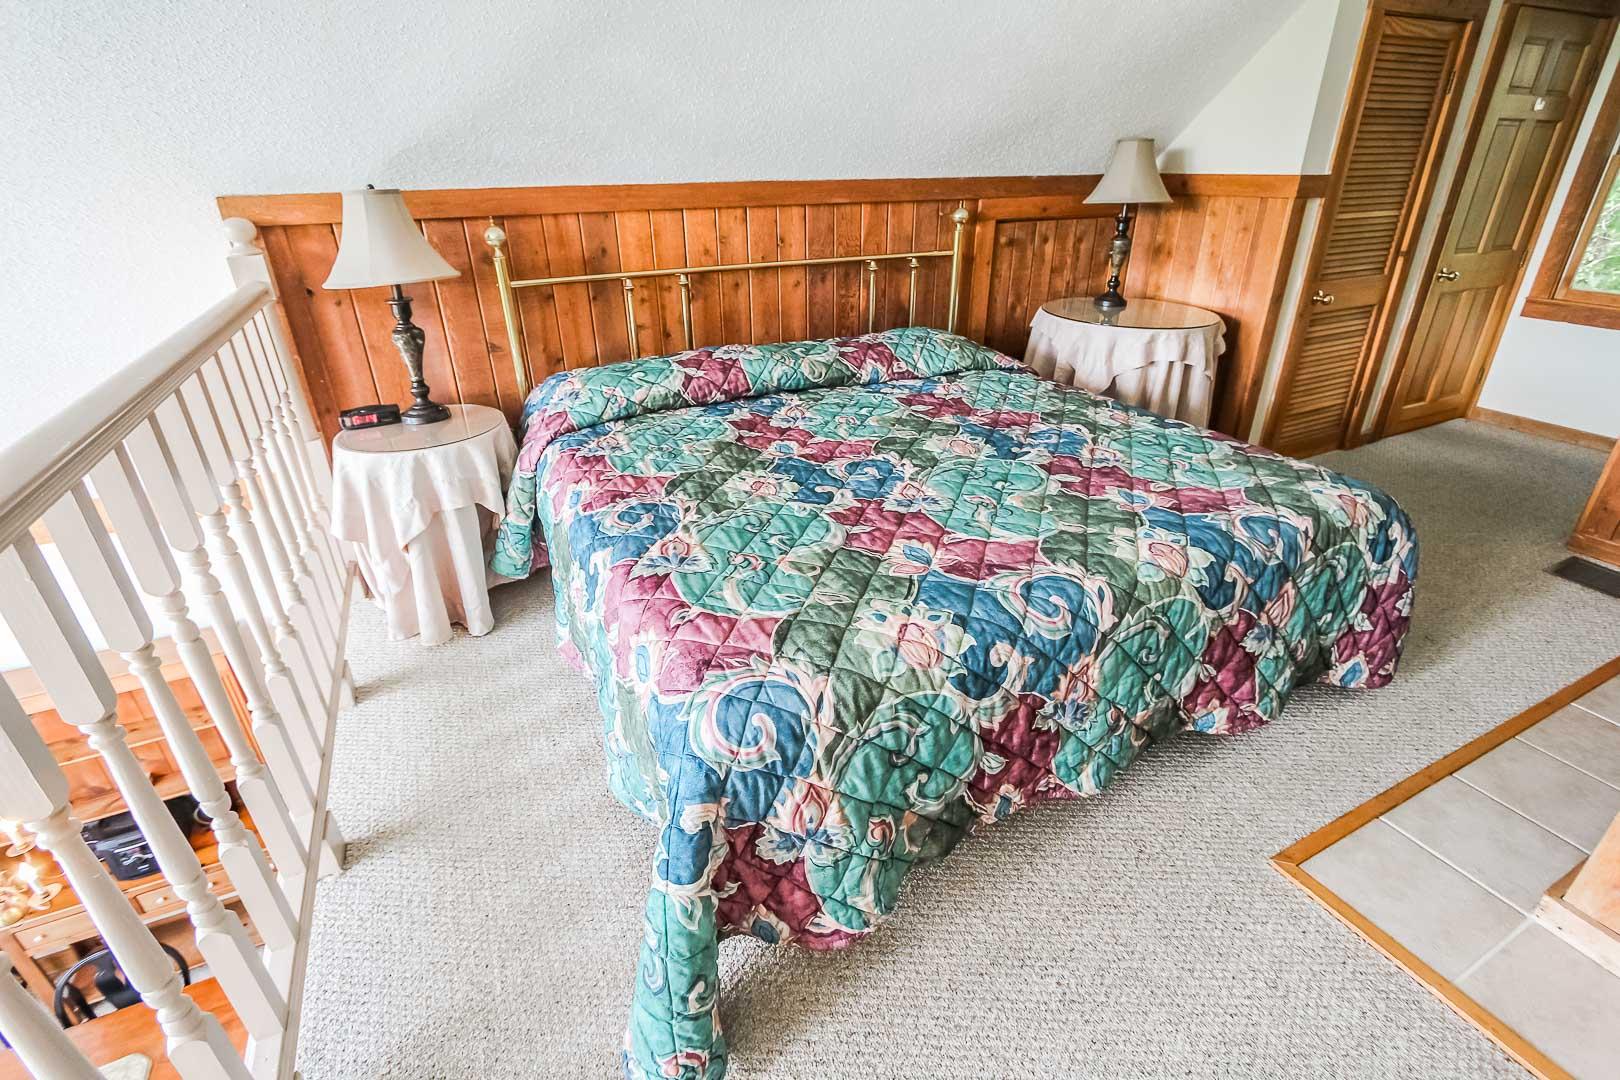 A cozy master bedroom at VRI's Alpine Crest Resort in Georgia.